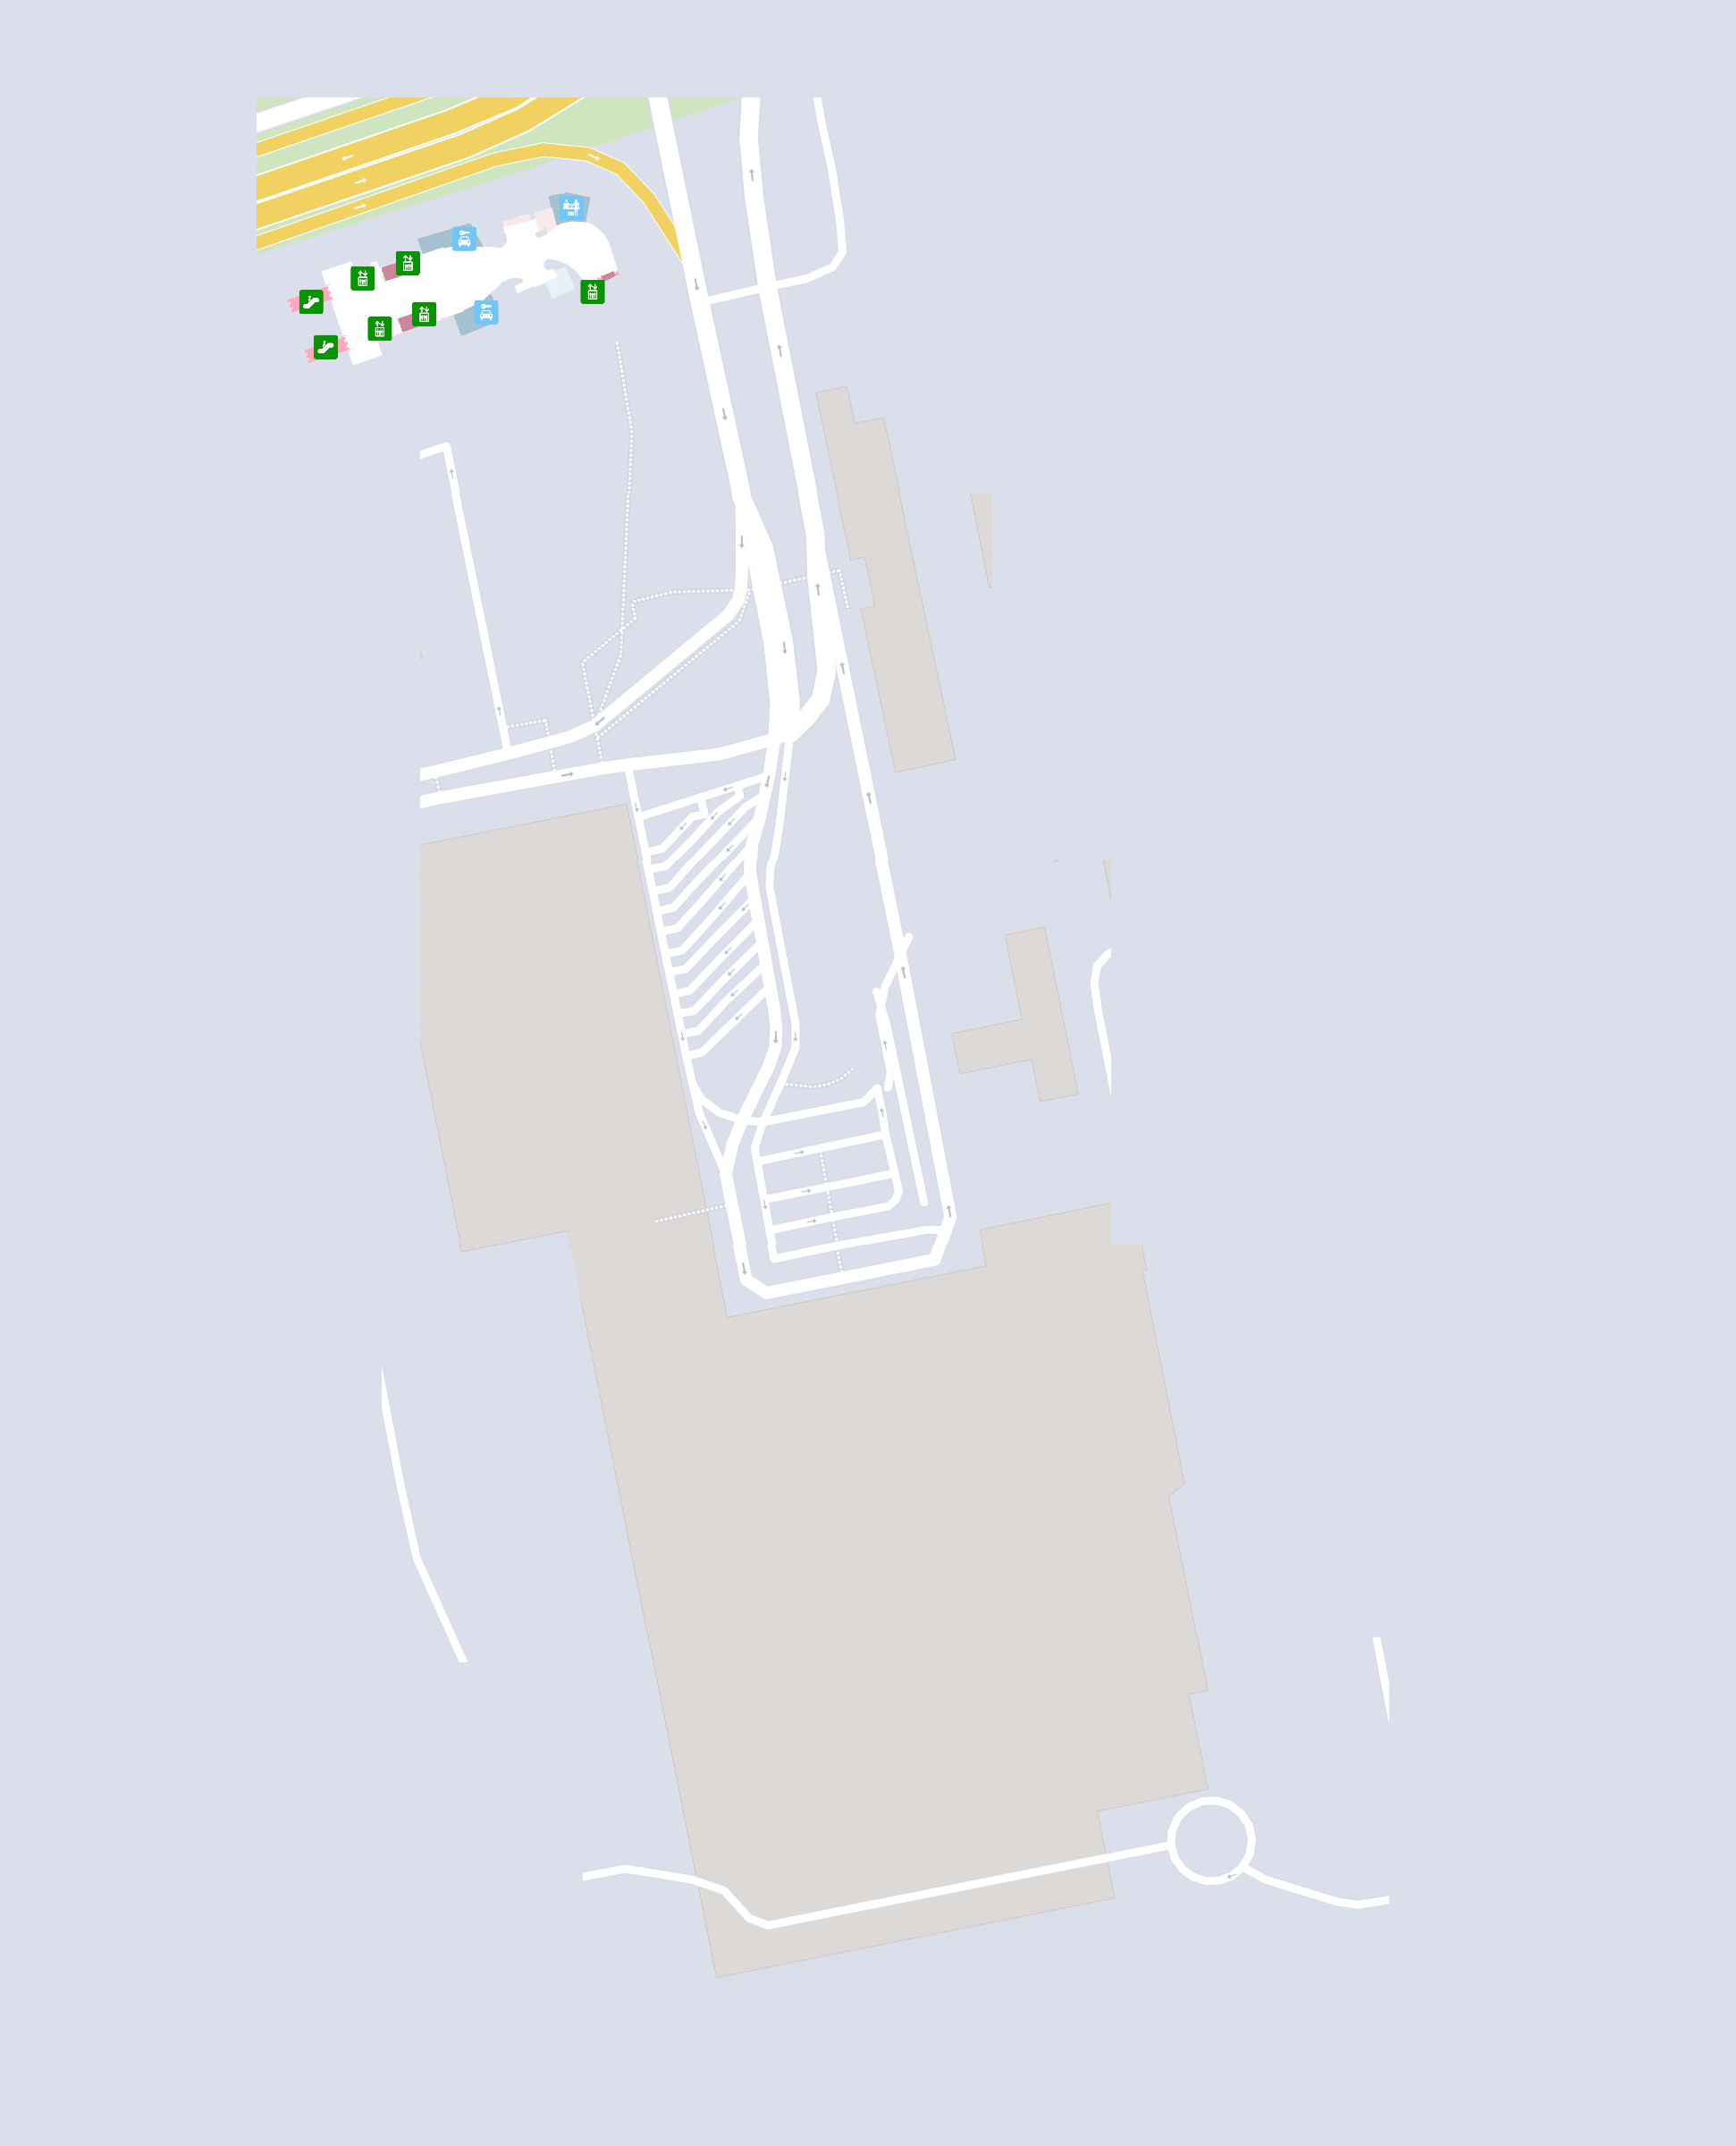 Malpensa Airport Map (MXP) - Printable Terminal Maps, Shops ... on map of san jose international airport, map of fukuoka airport, map of mexico city international airport, map of port columbus international airport, map of suvarnabhumi airport, map of stewart international airport, map of bob hope airport, map of split airport, map of piarco international airport, map of ronald reagan washington national airport, map of kuwait international airport, map of chicago midway international airport, map of ninoy aquino international airport, map of princess juliana international airport, map of hong kong international airport, map of charlotte douglas international airport, map of san francisco international airport, map of cape town international airport, map of newark liberty international airport, map of salt lake city international airport,